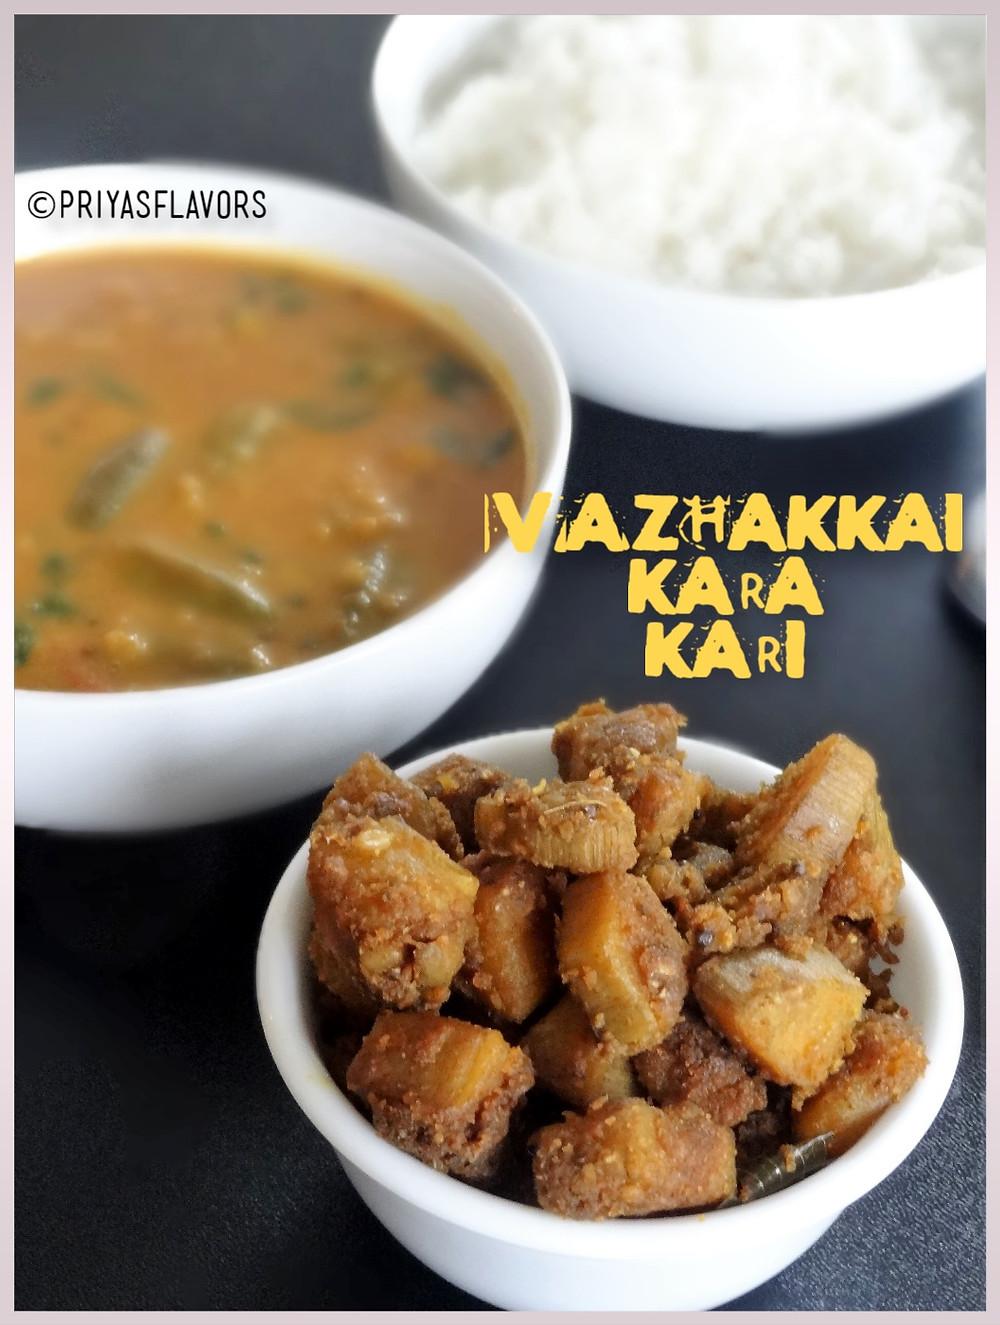 vazhakkai kara curry